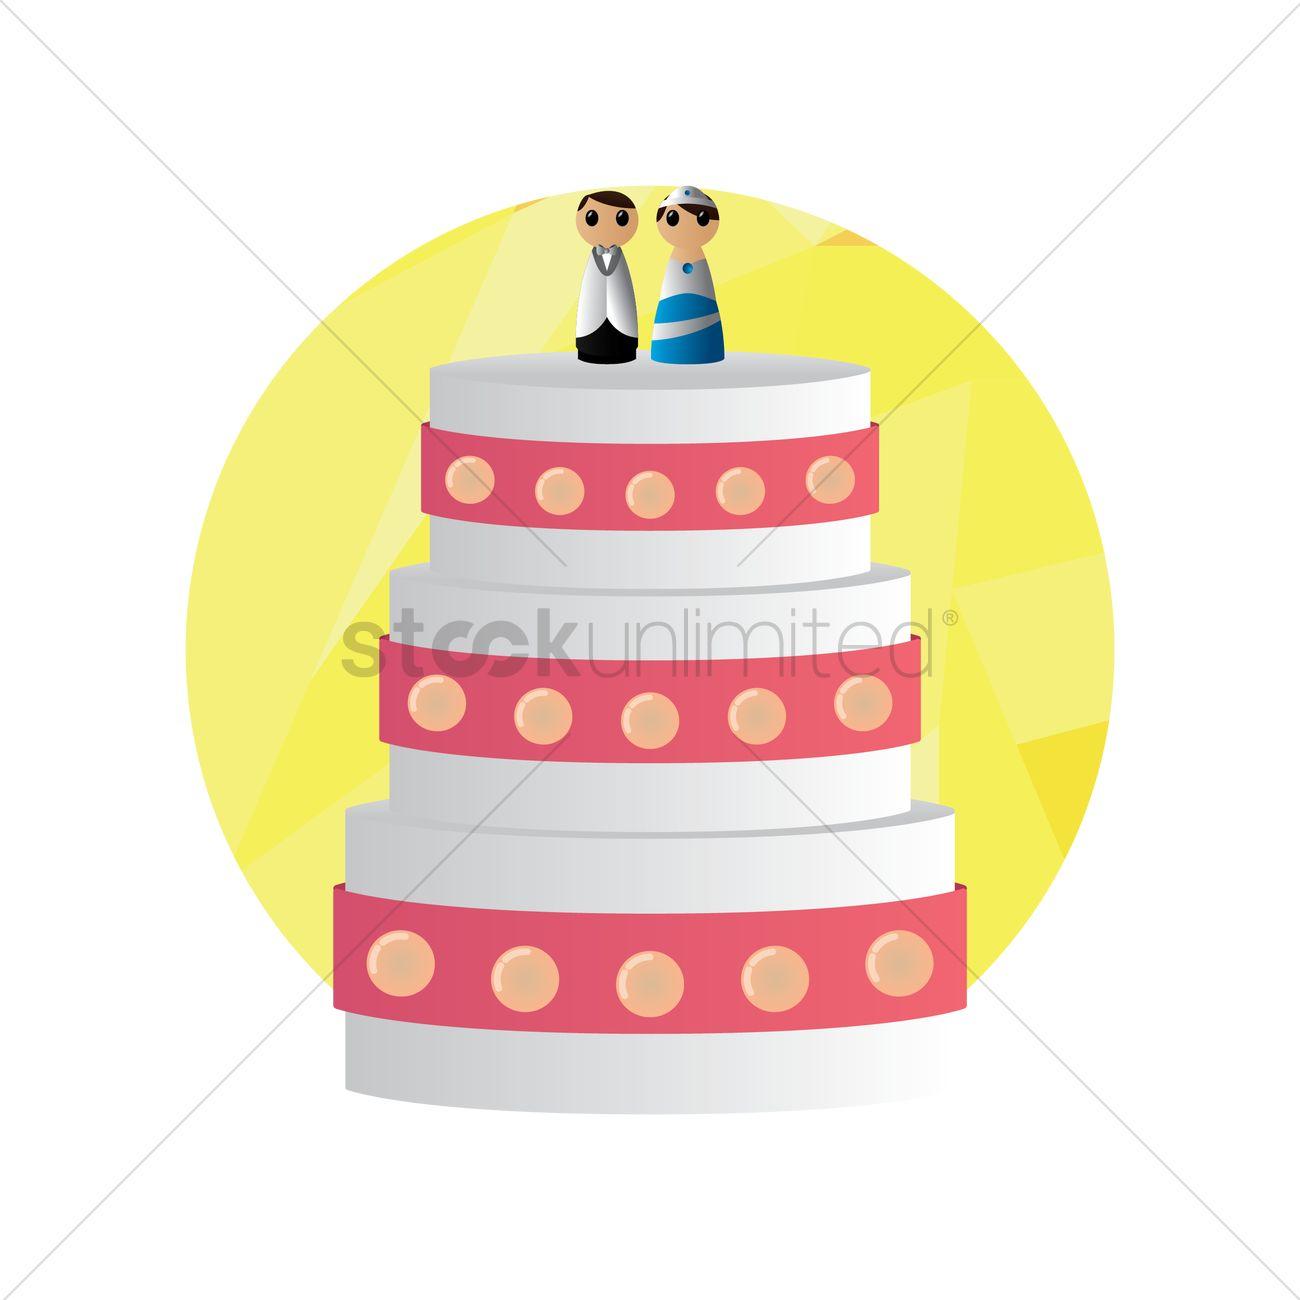 Wedding cake Vector Image - 1340201 | StockUnlimited